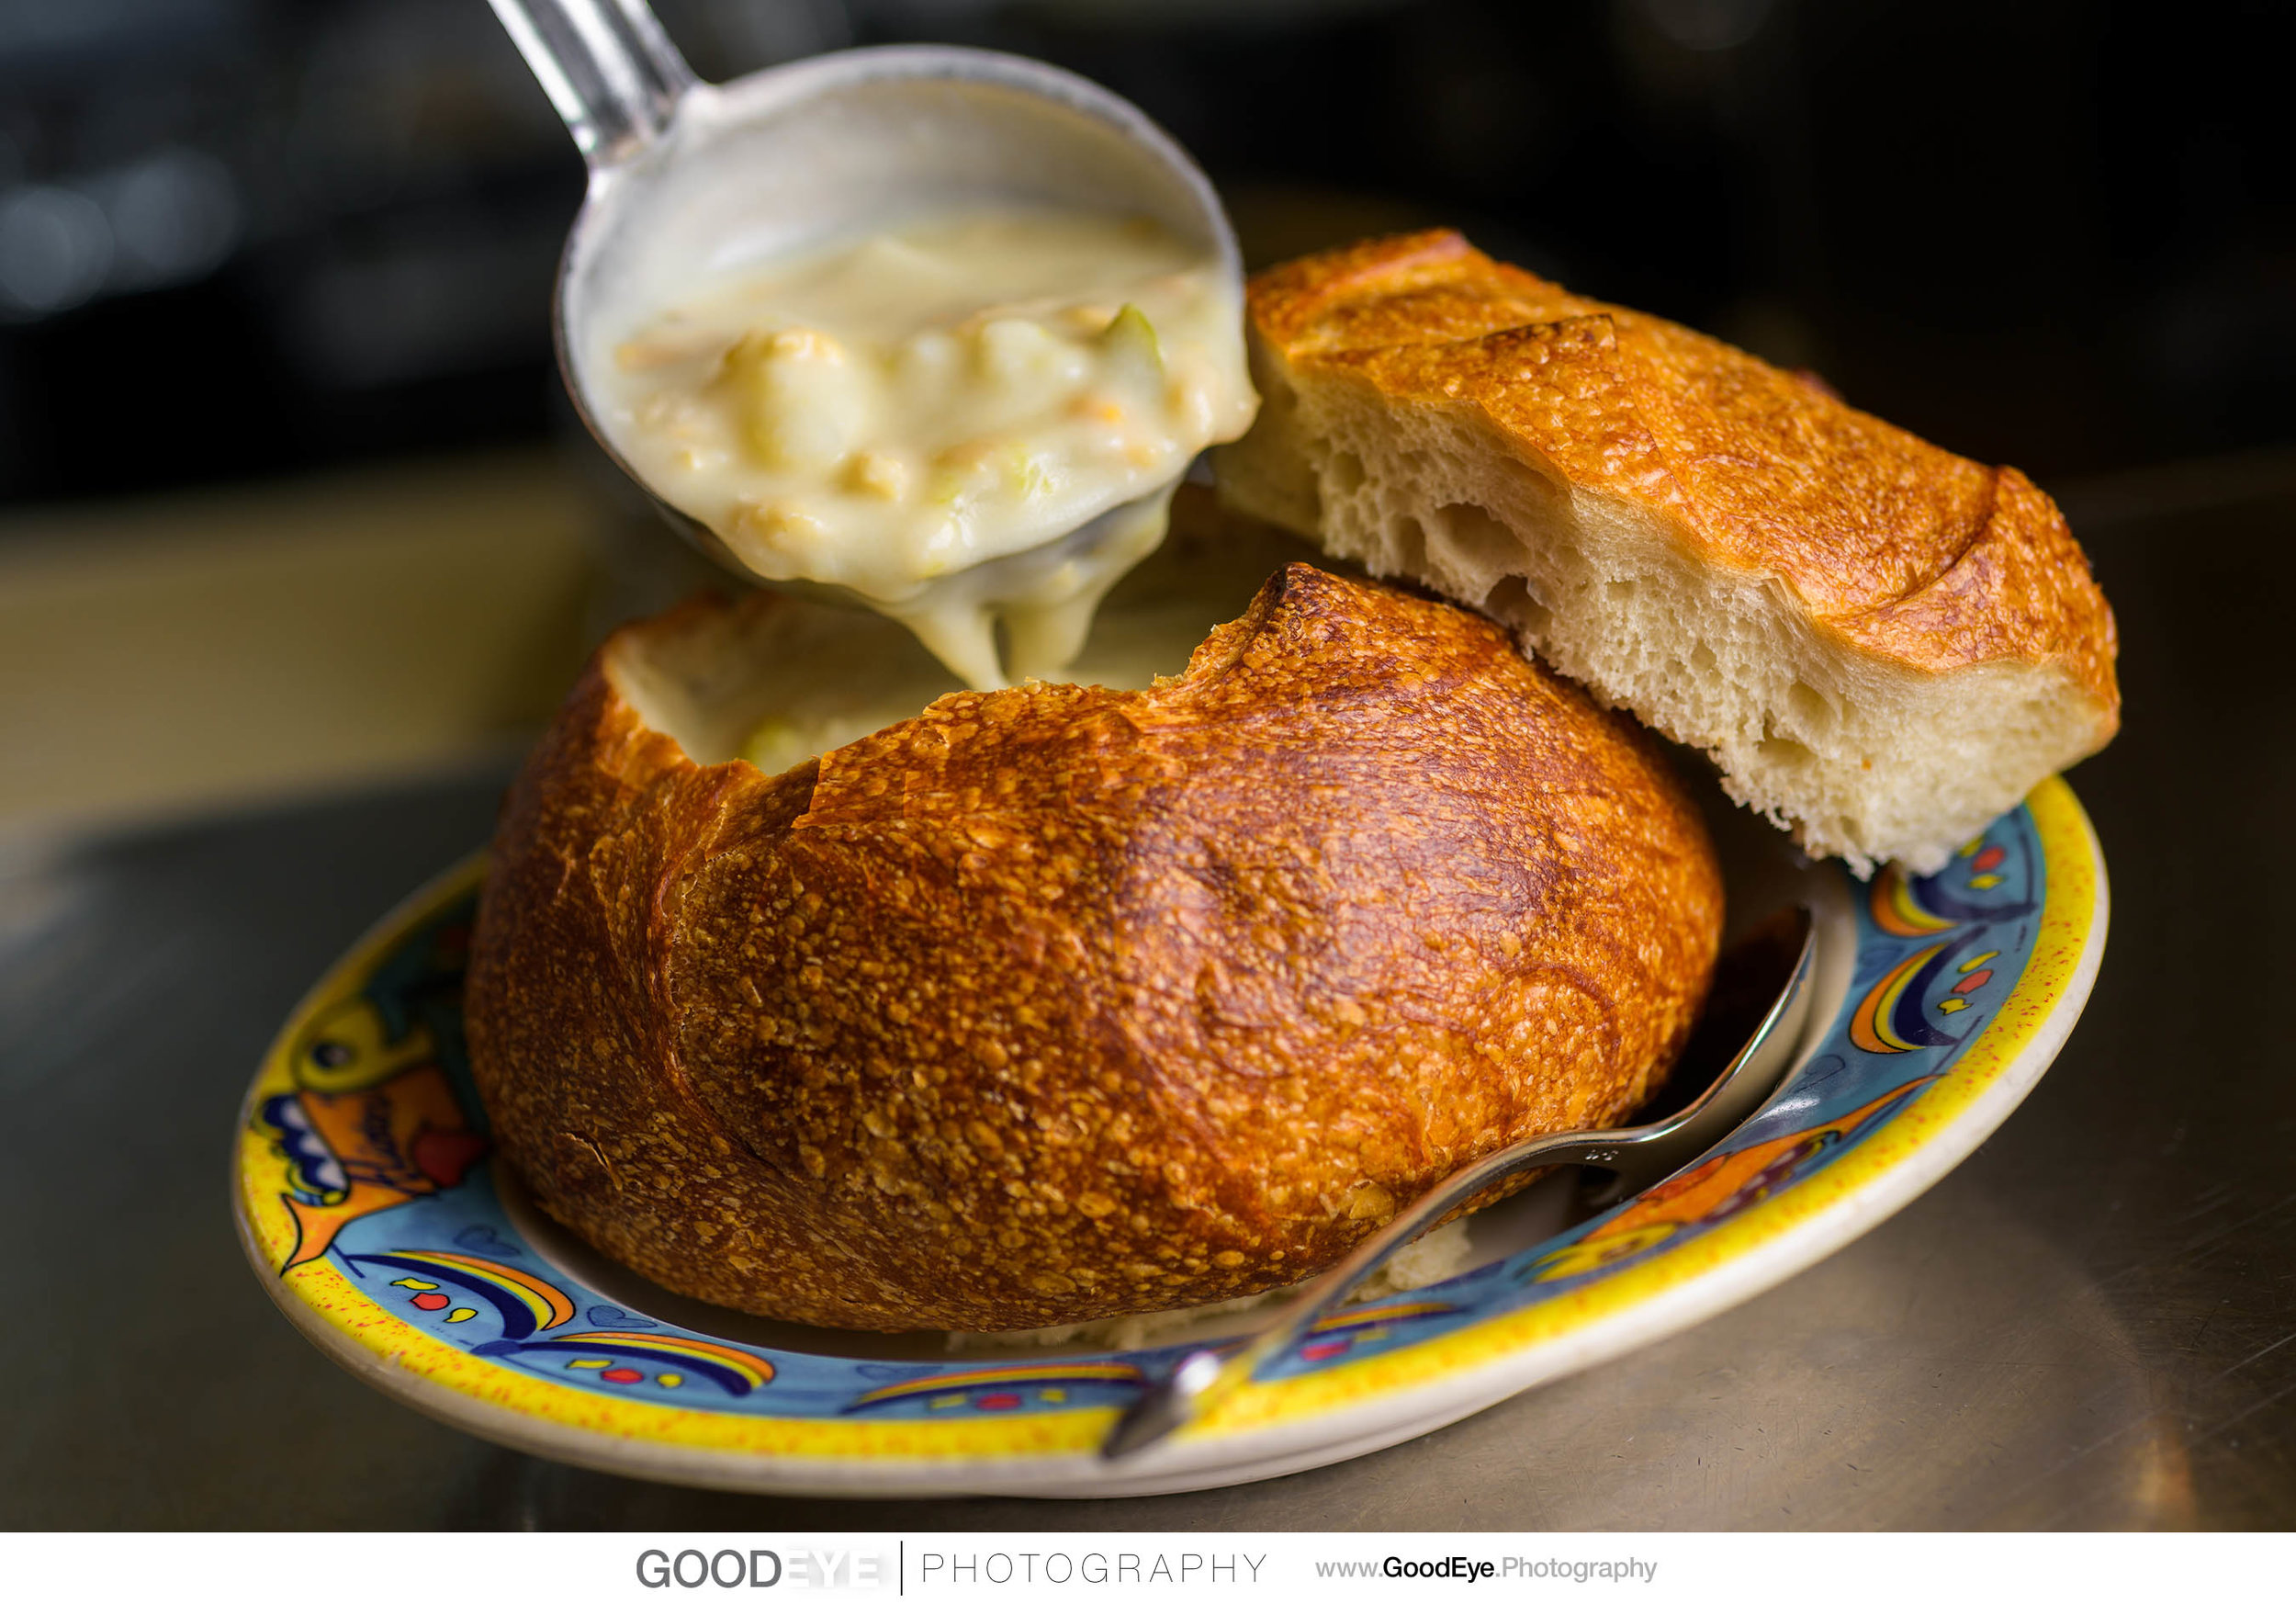 6186_Cafe_8_Aliotos_San_Francisco_Food_Photography_web.jpg